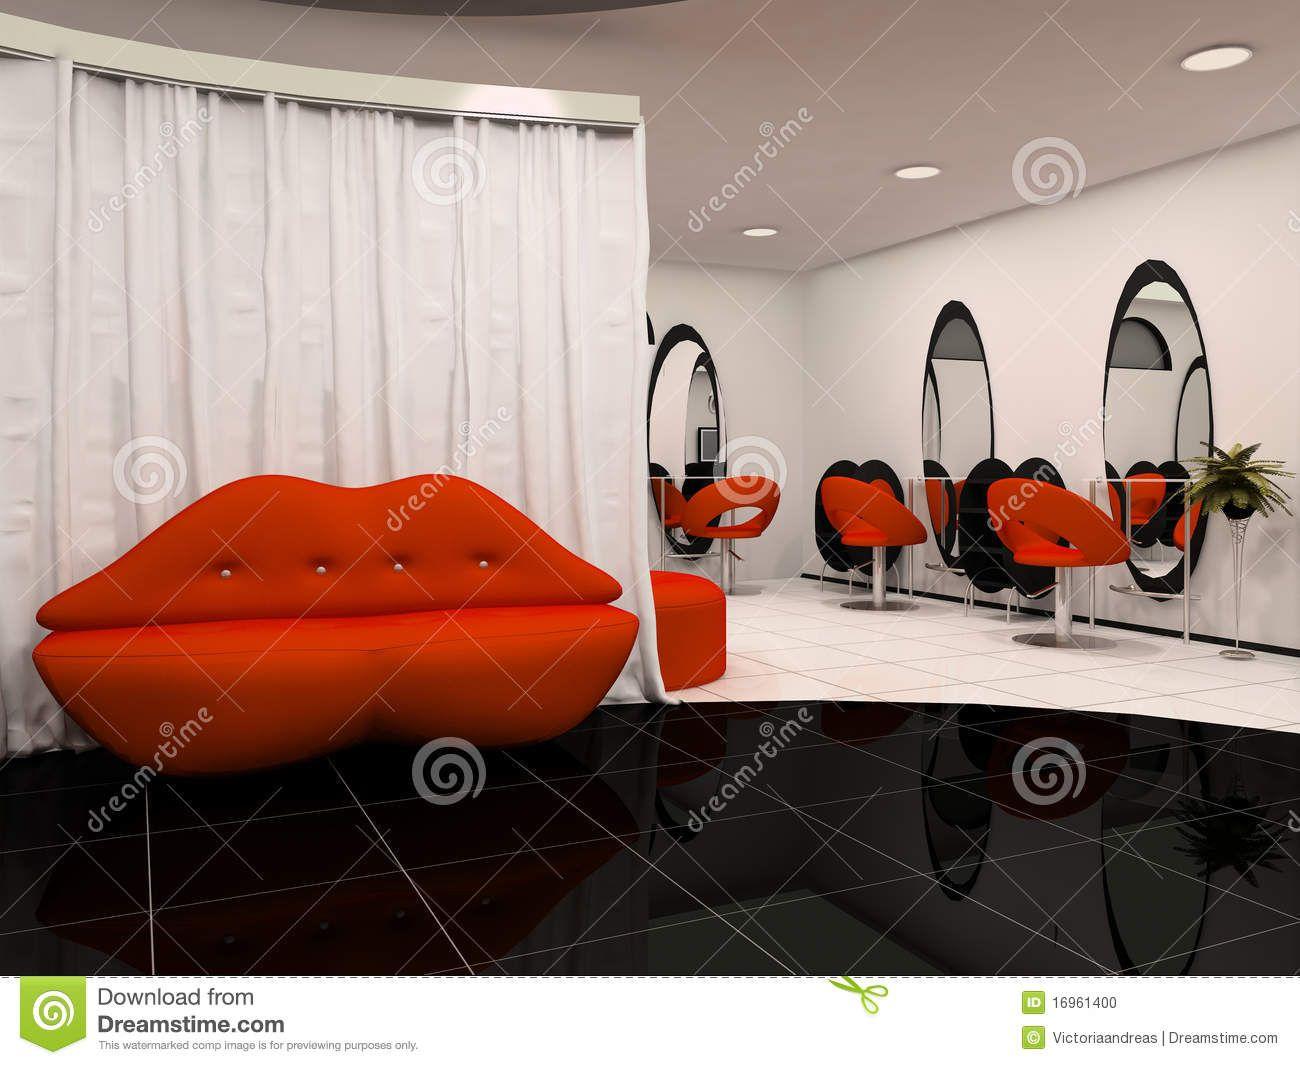 red black and white salon decor - Google Search | salon things ...